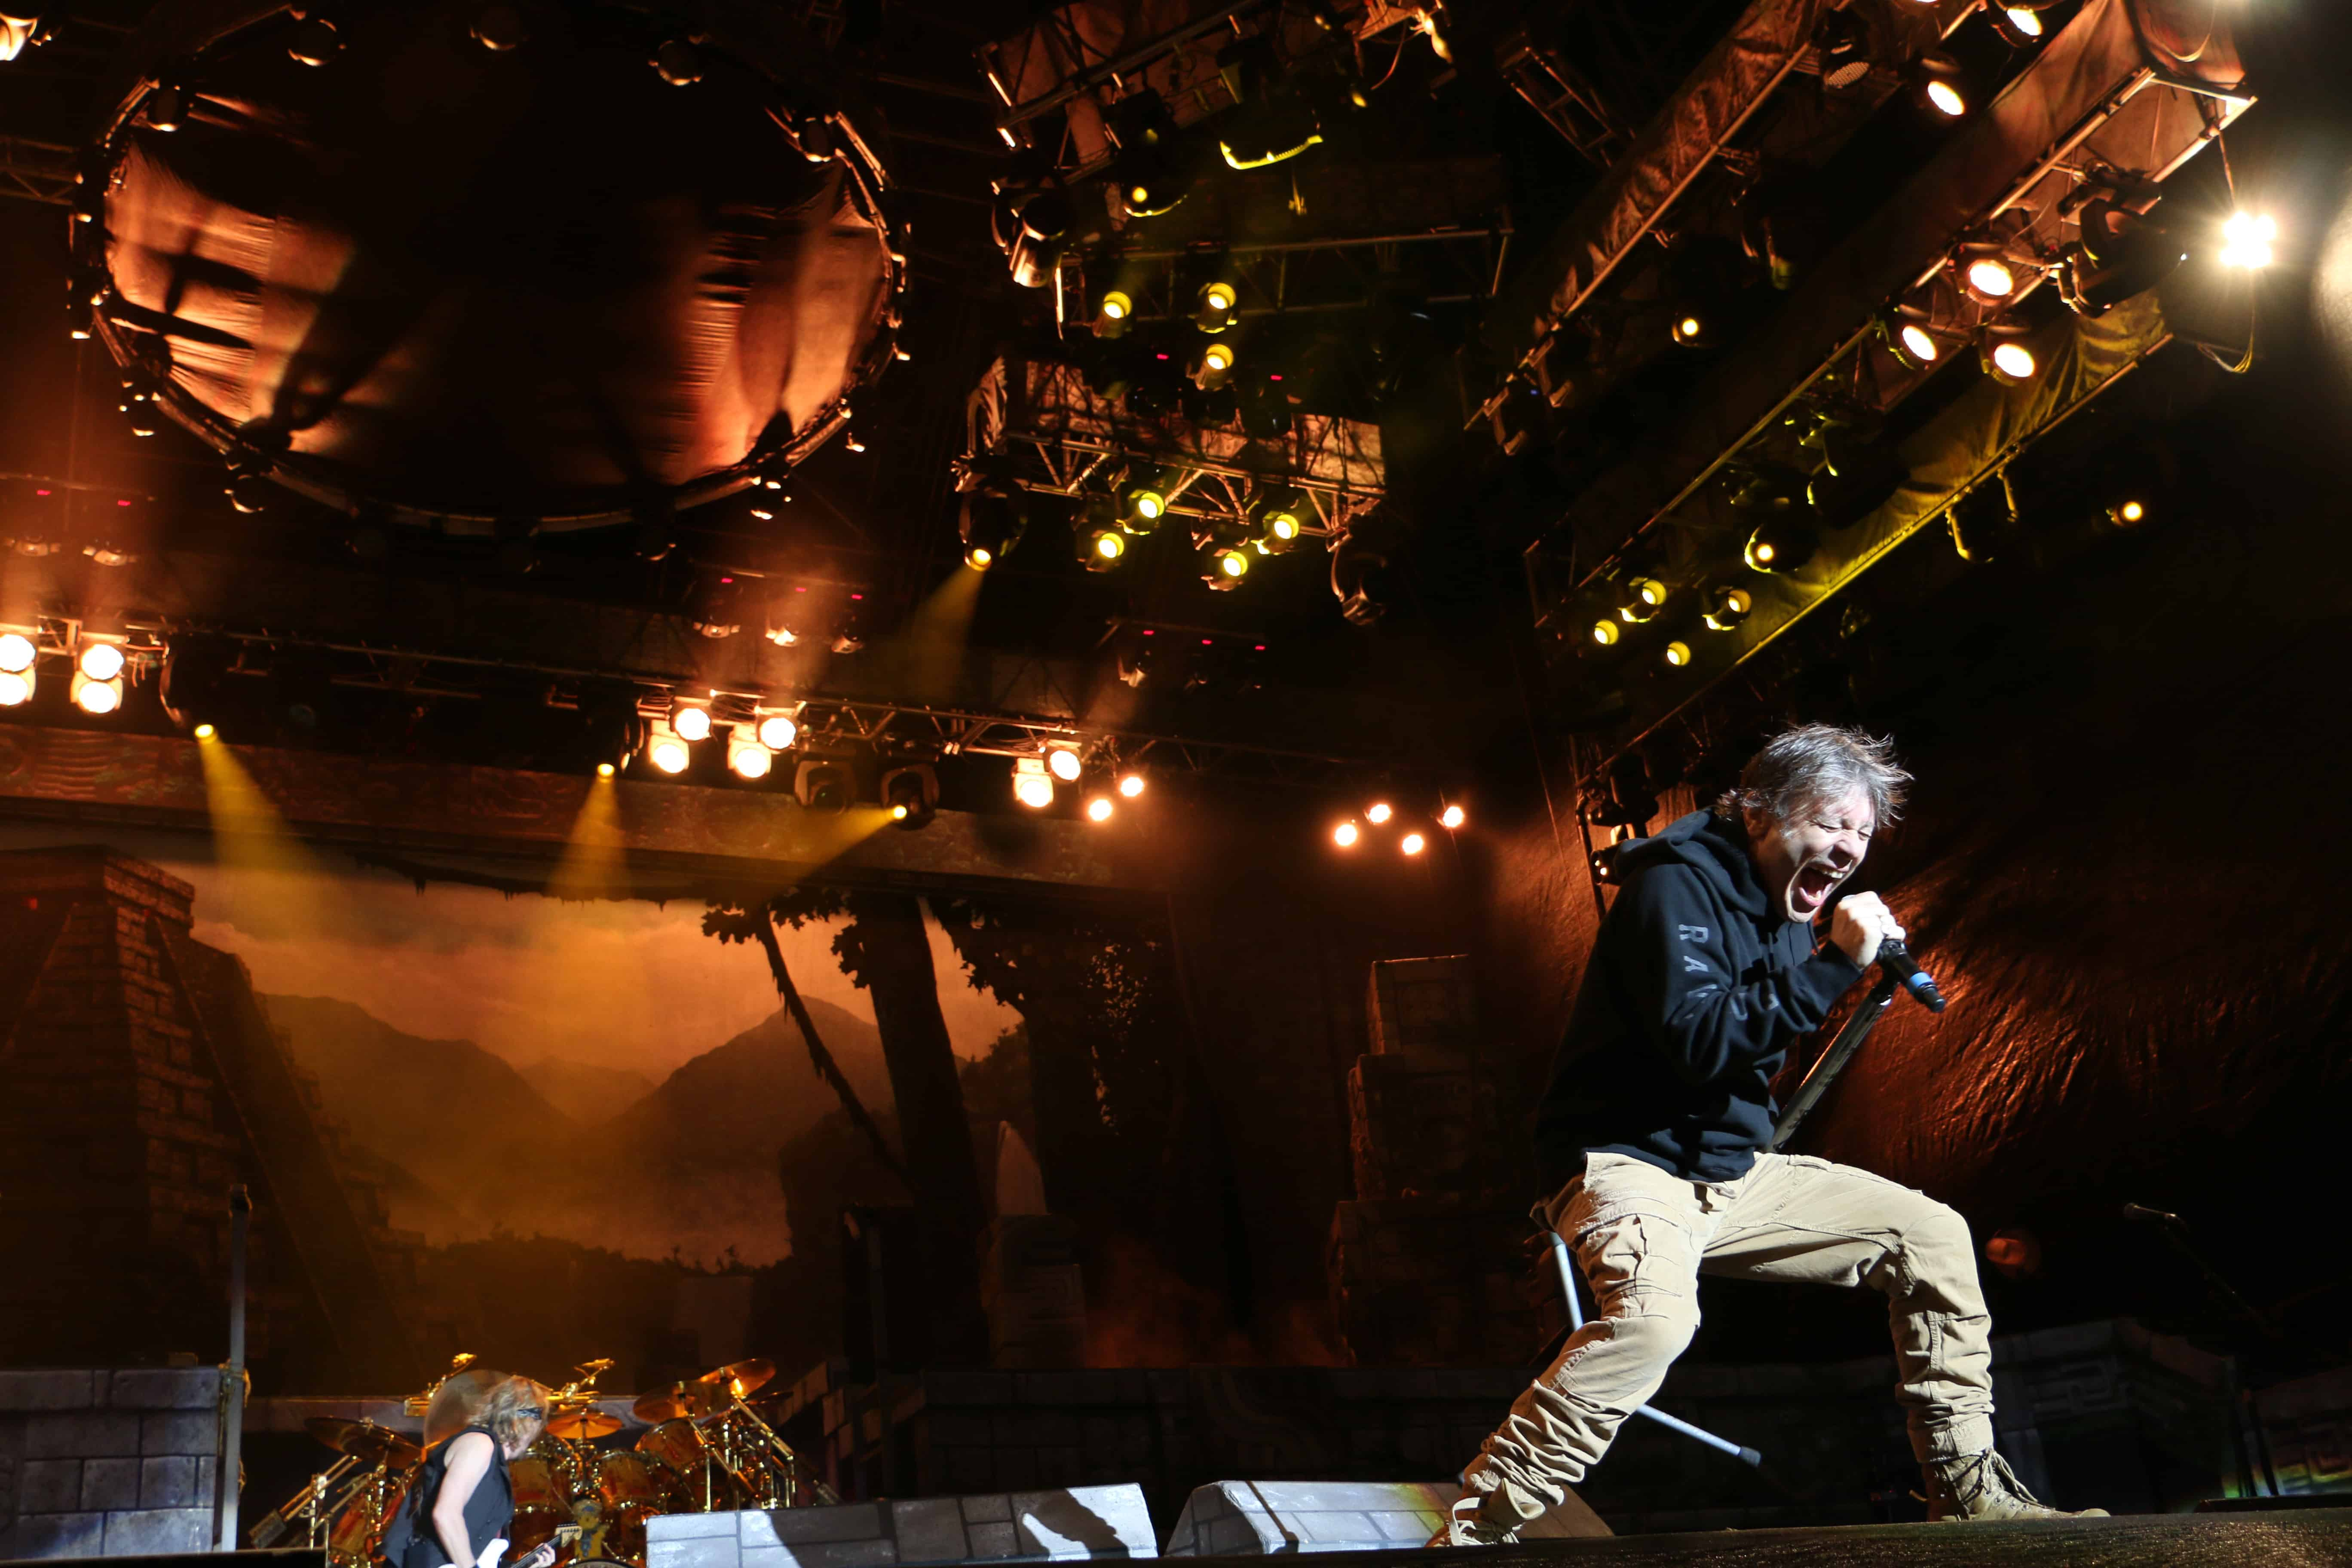 Iron Maiden concert, March 8, 2016, San José.